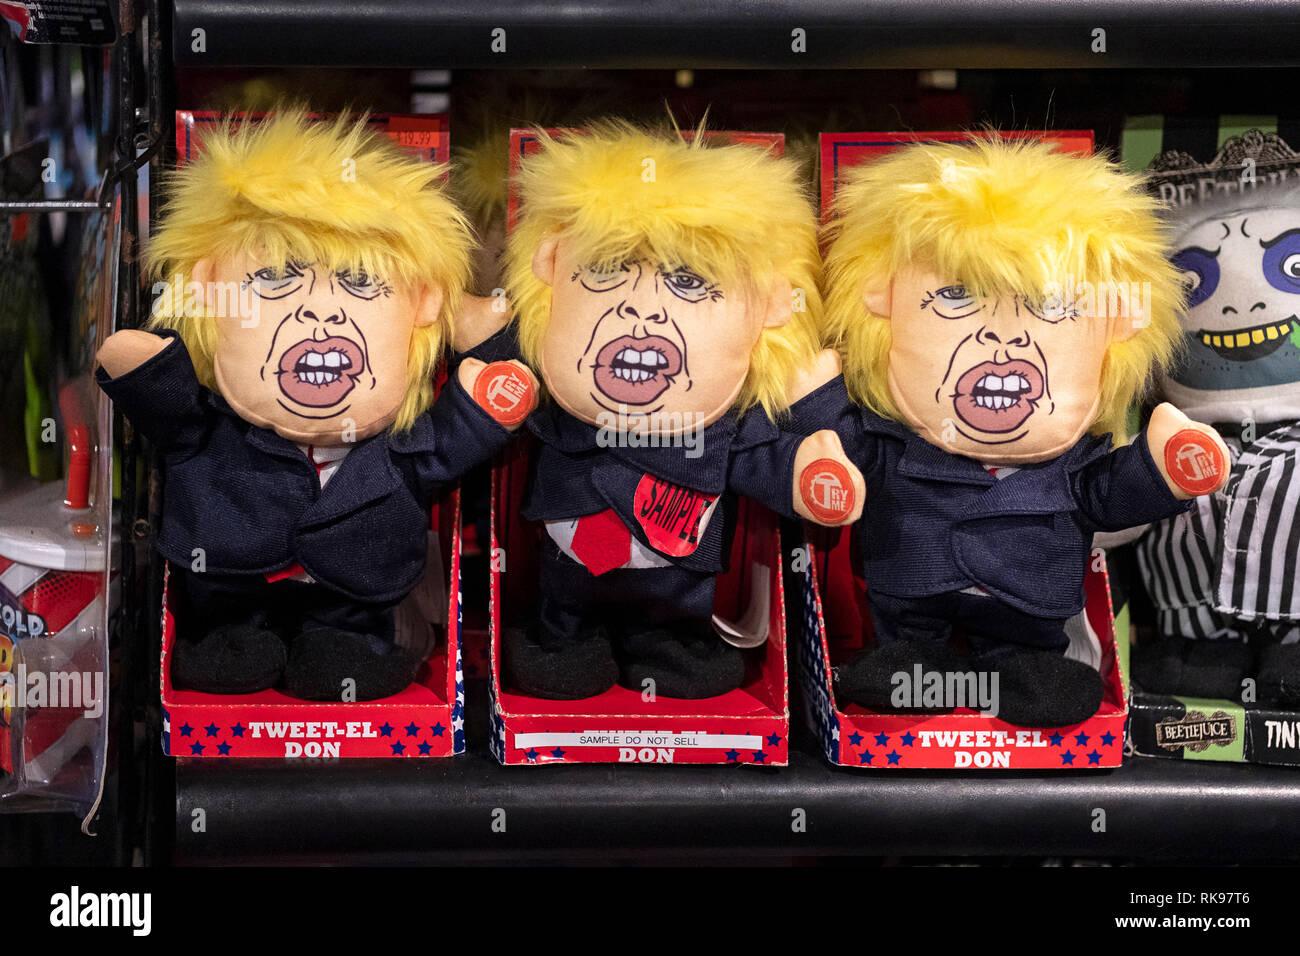 Tweet El-Don Tiny Terror doll